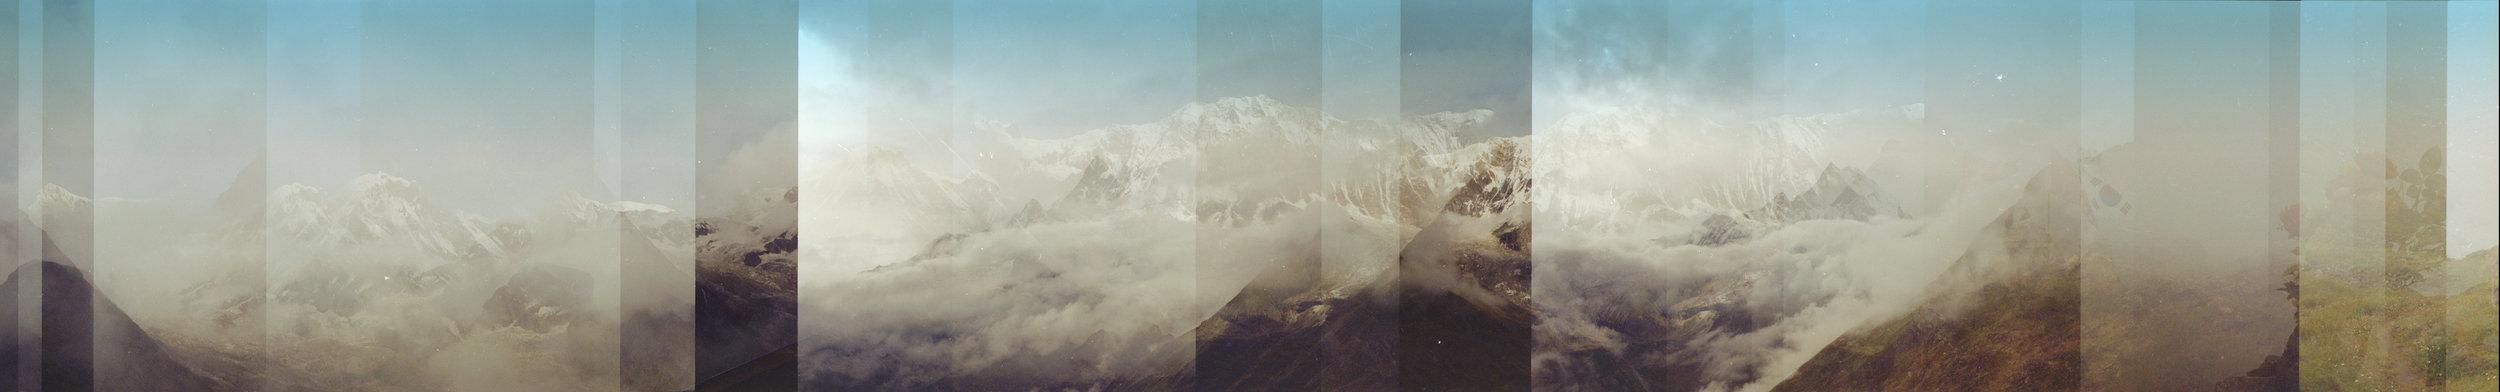 ANNAPURNA-ARTWORK-PHOTOGRAPHY.jpg